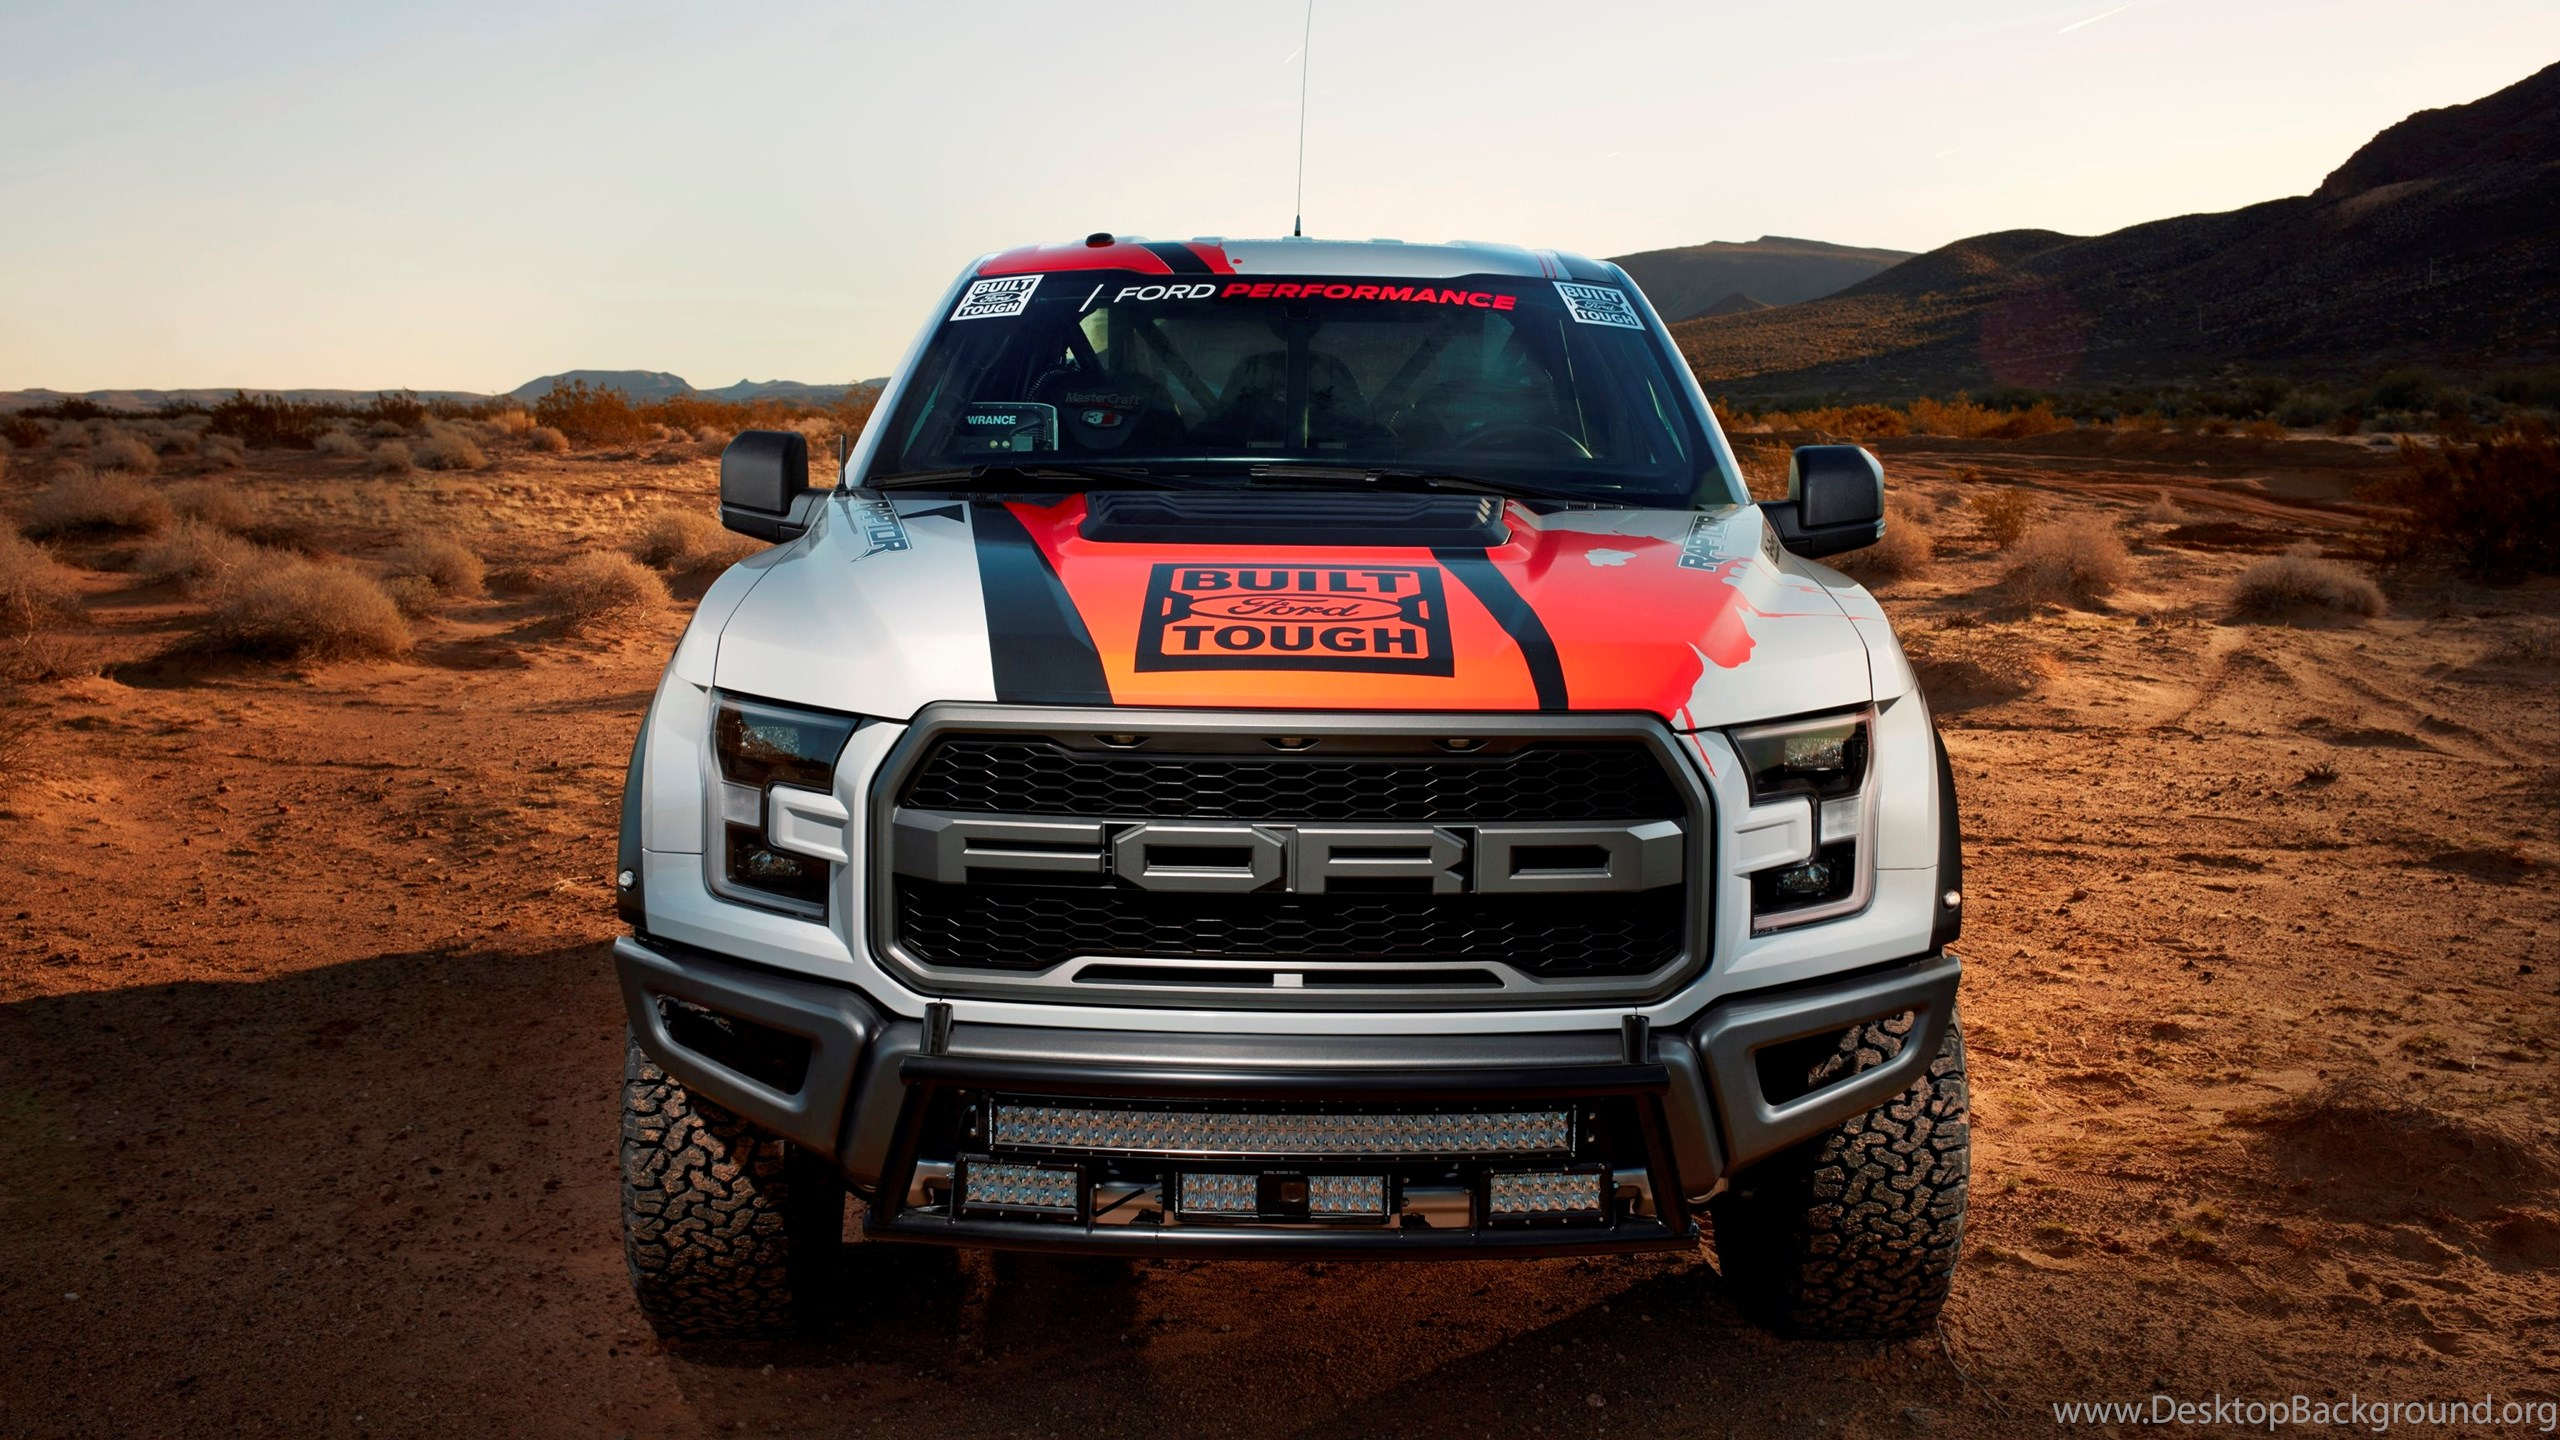 Ford F 150 Raptor Race Truck Wallpapers Hd Free Desktop Backgrounds